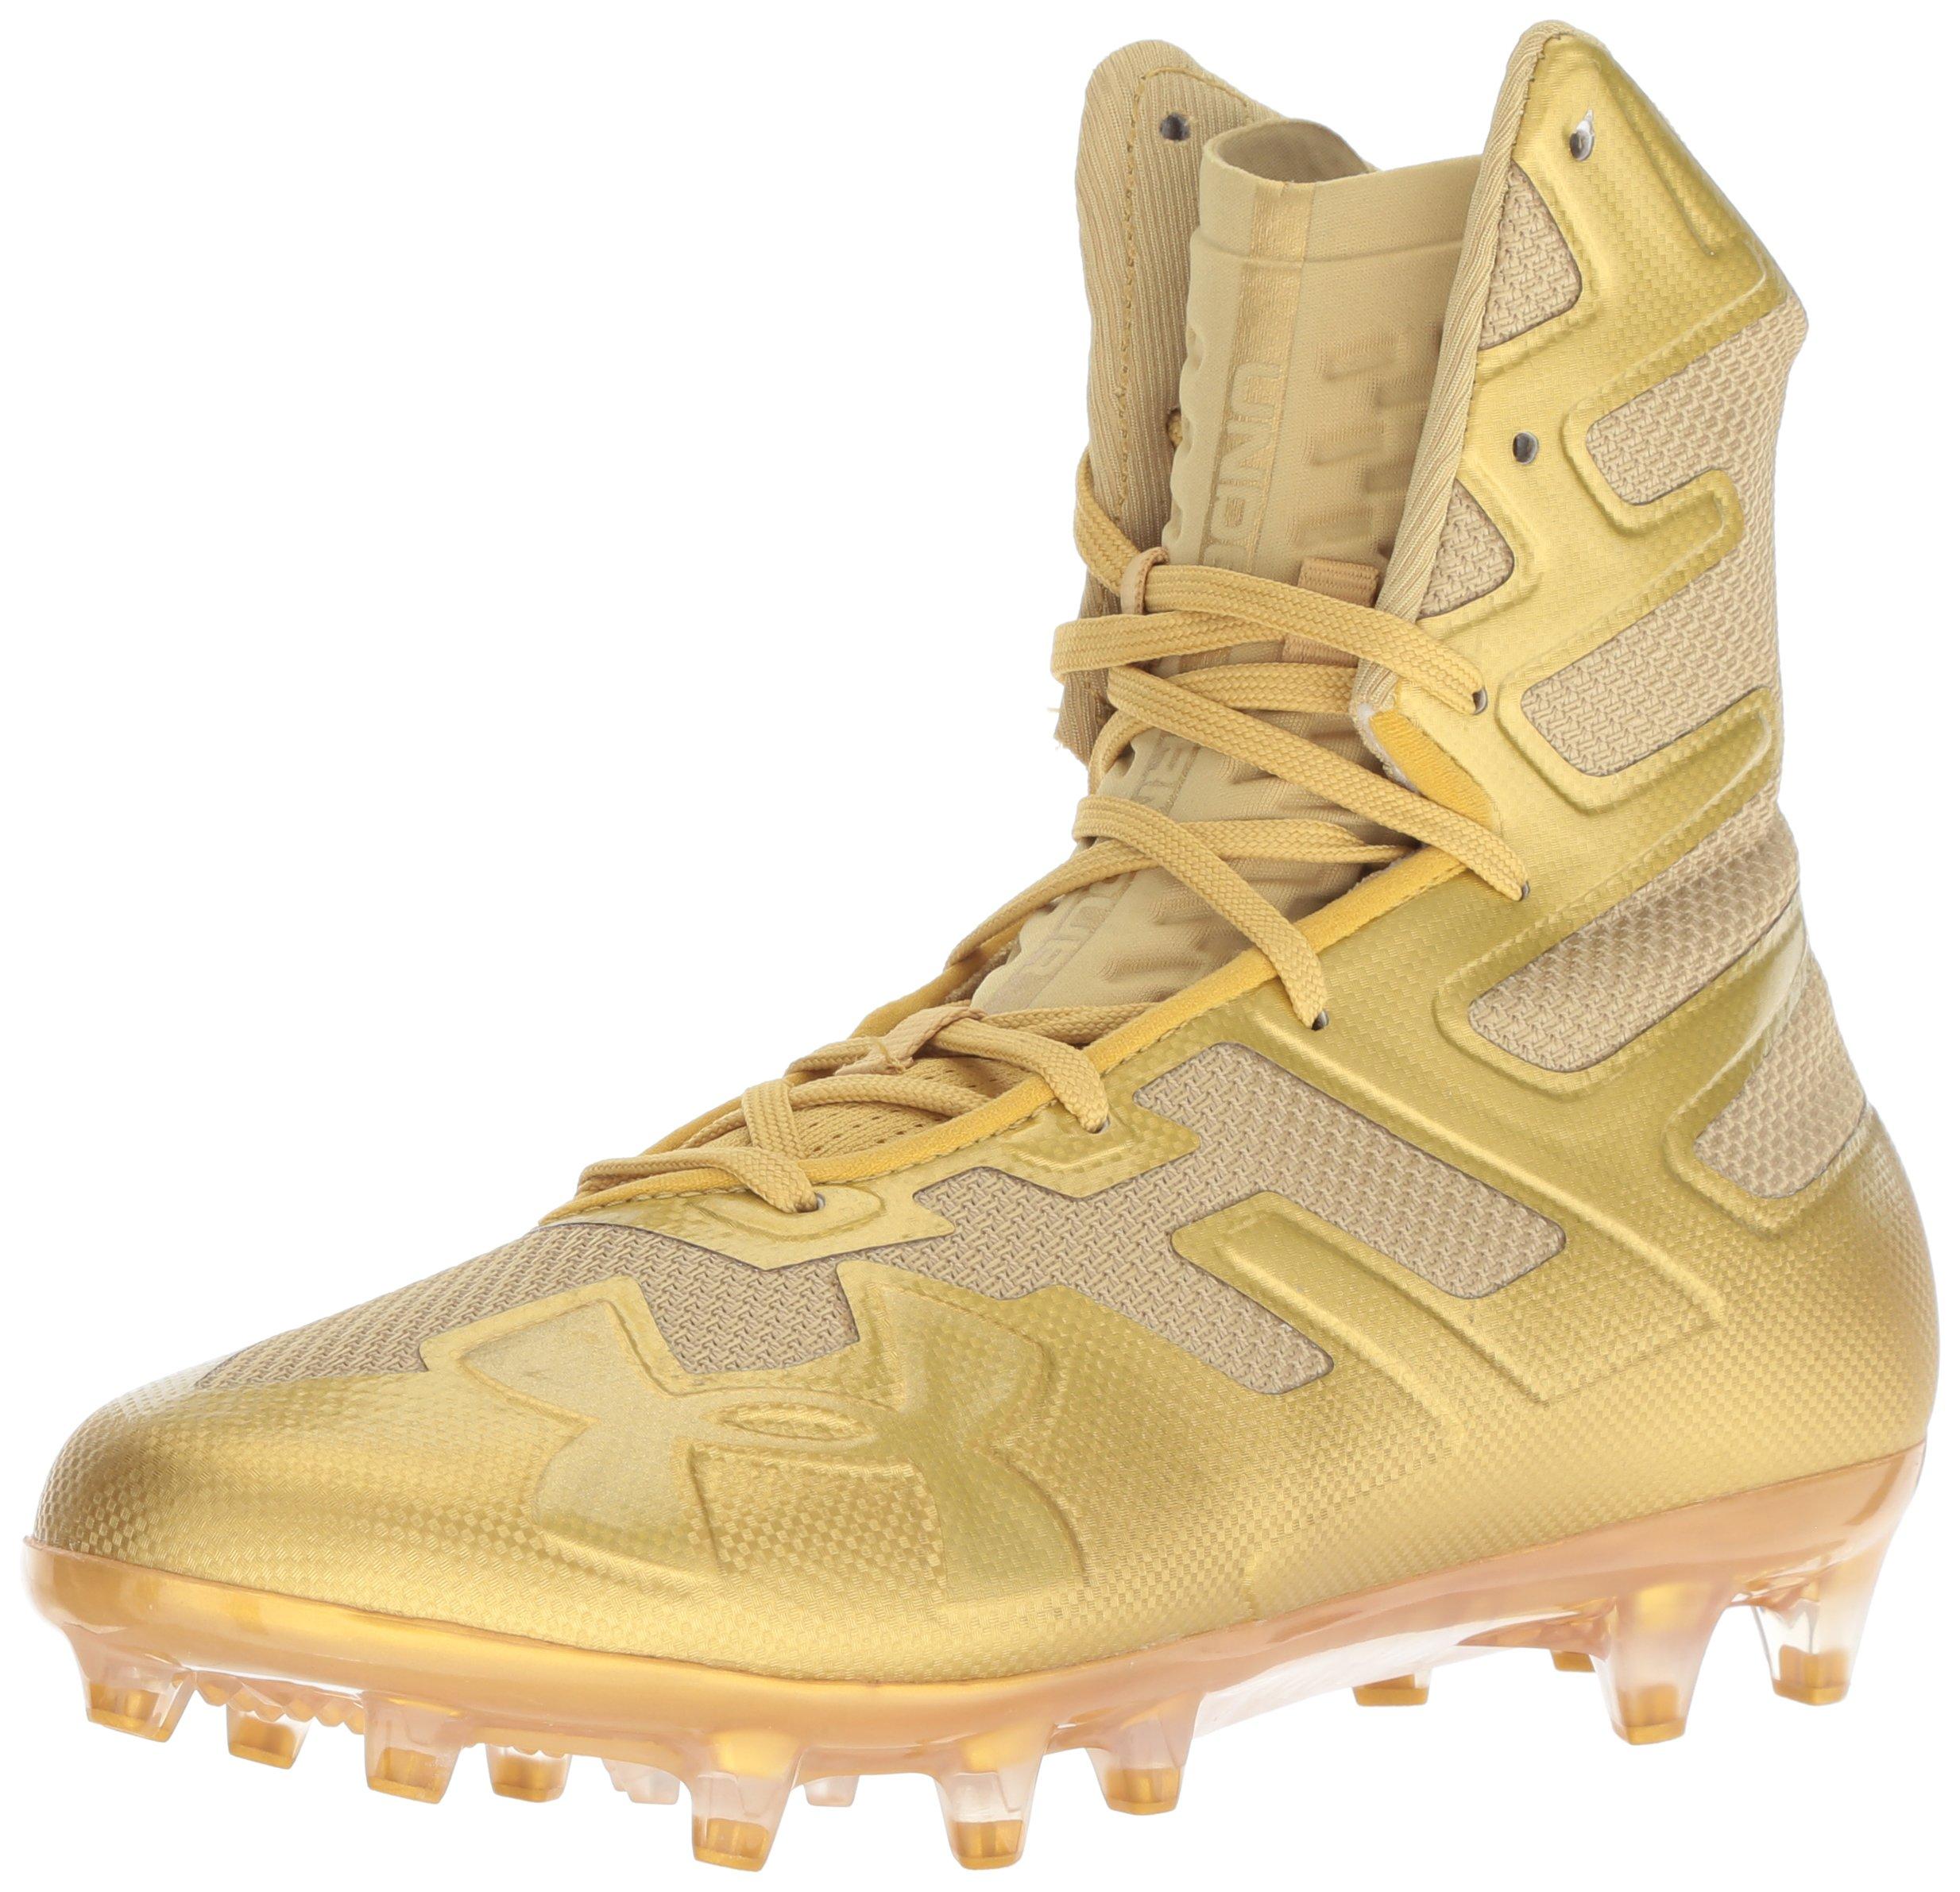 Under Armour Men's Highlight MC Football Shoe 900/Metallic Gold, 6.5